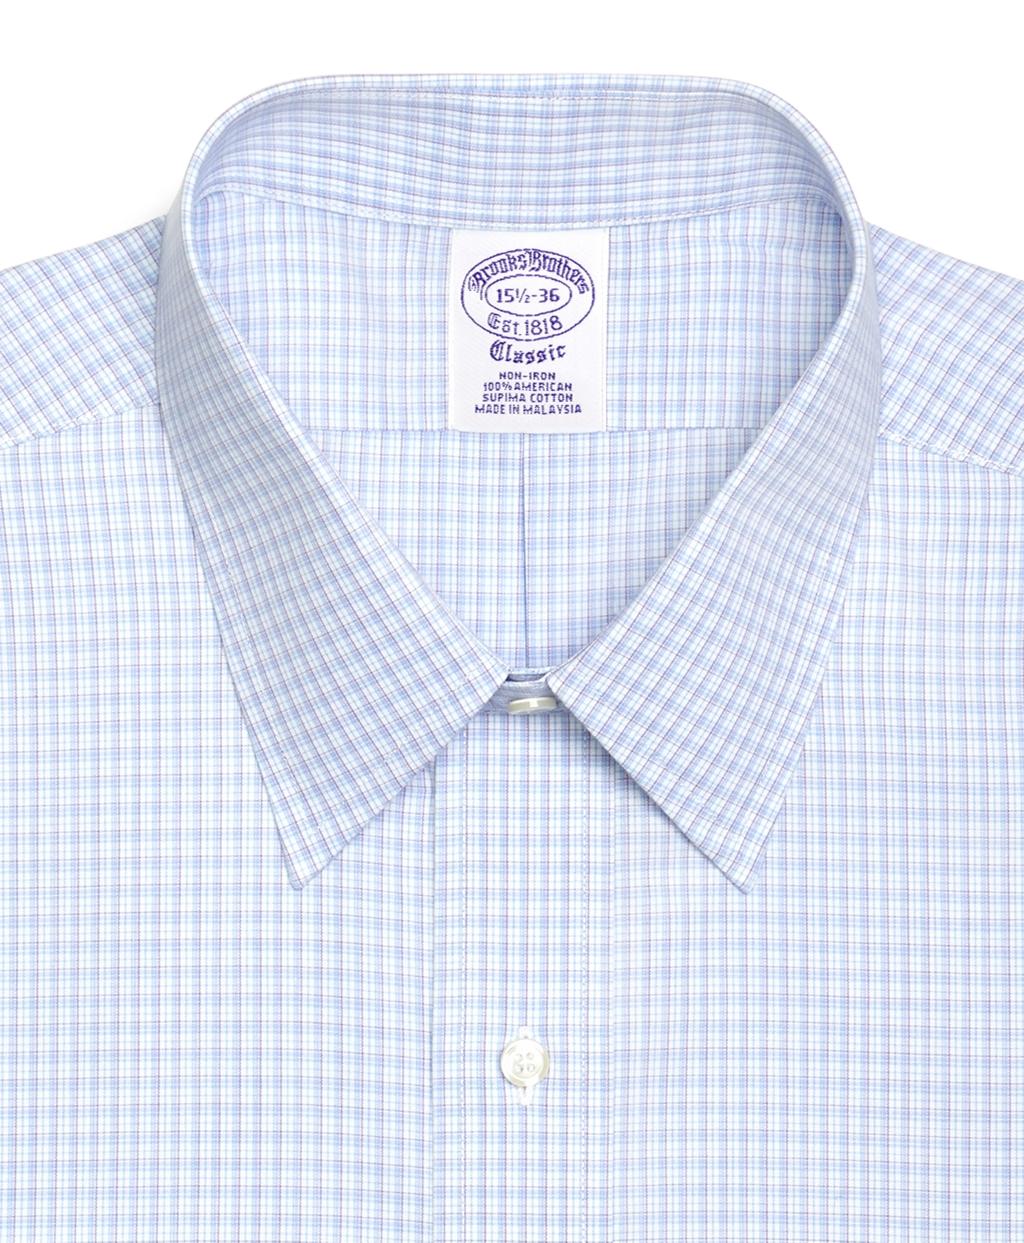 Brooks Brothers Pima Cotton Dress Shirts Bcd Tofu House